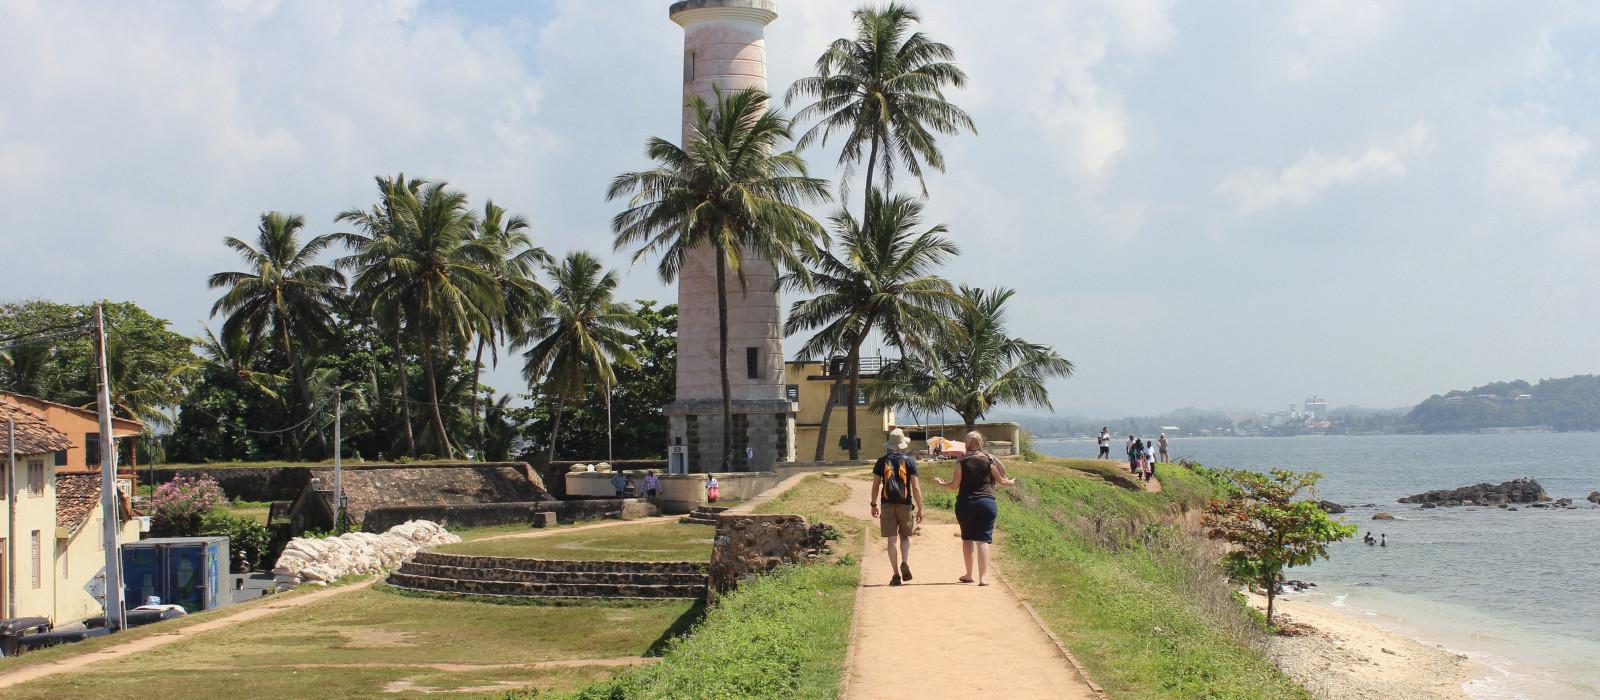 Hotel Yara Galle Fort Sri Lanka